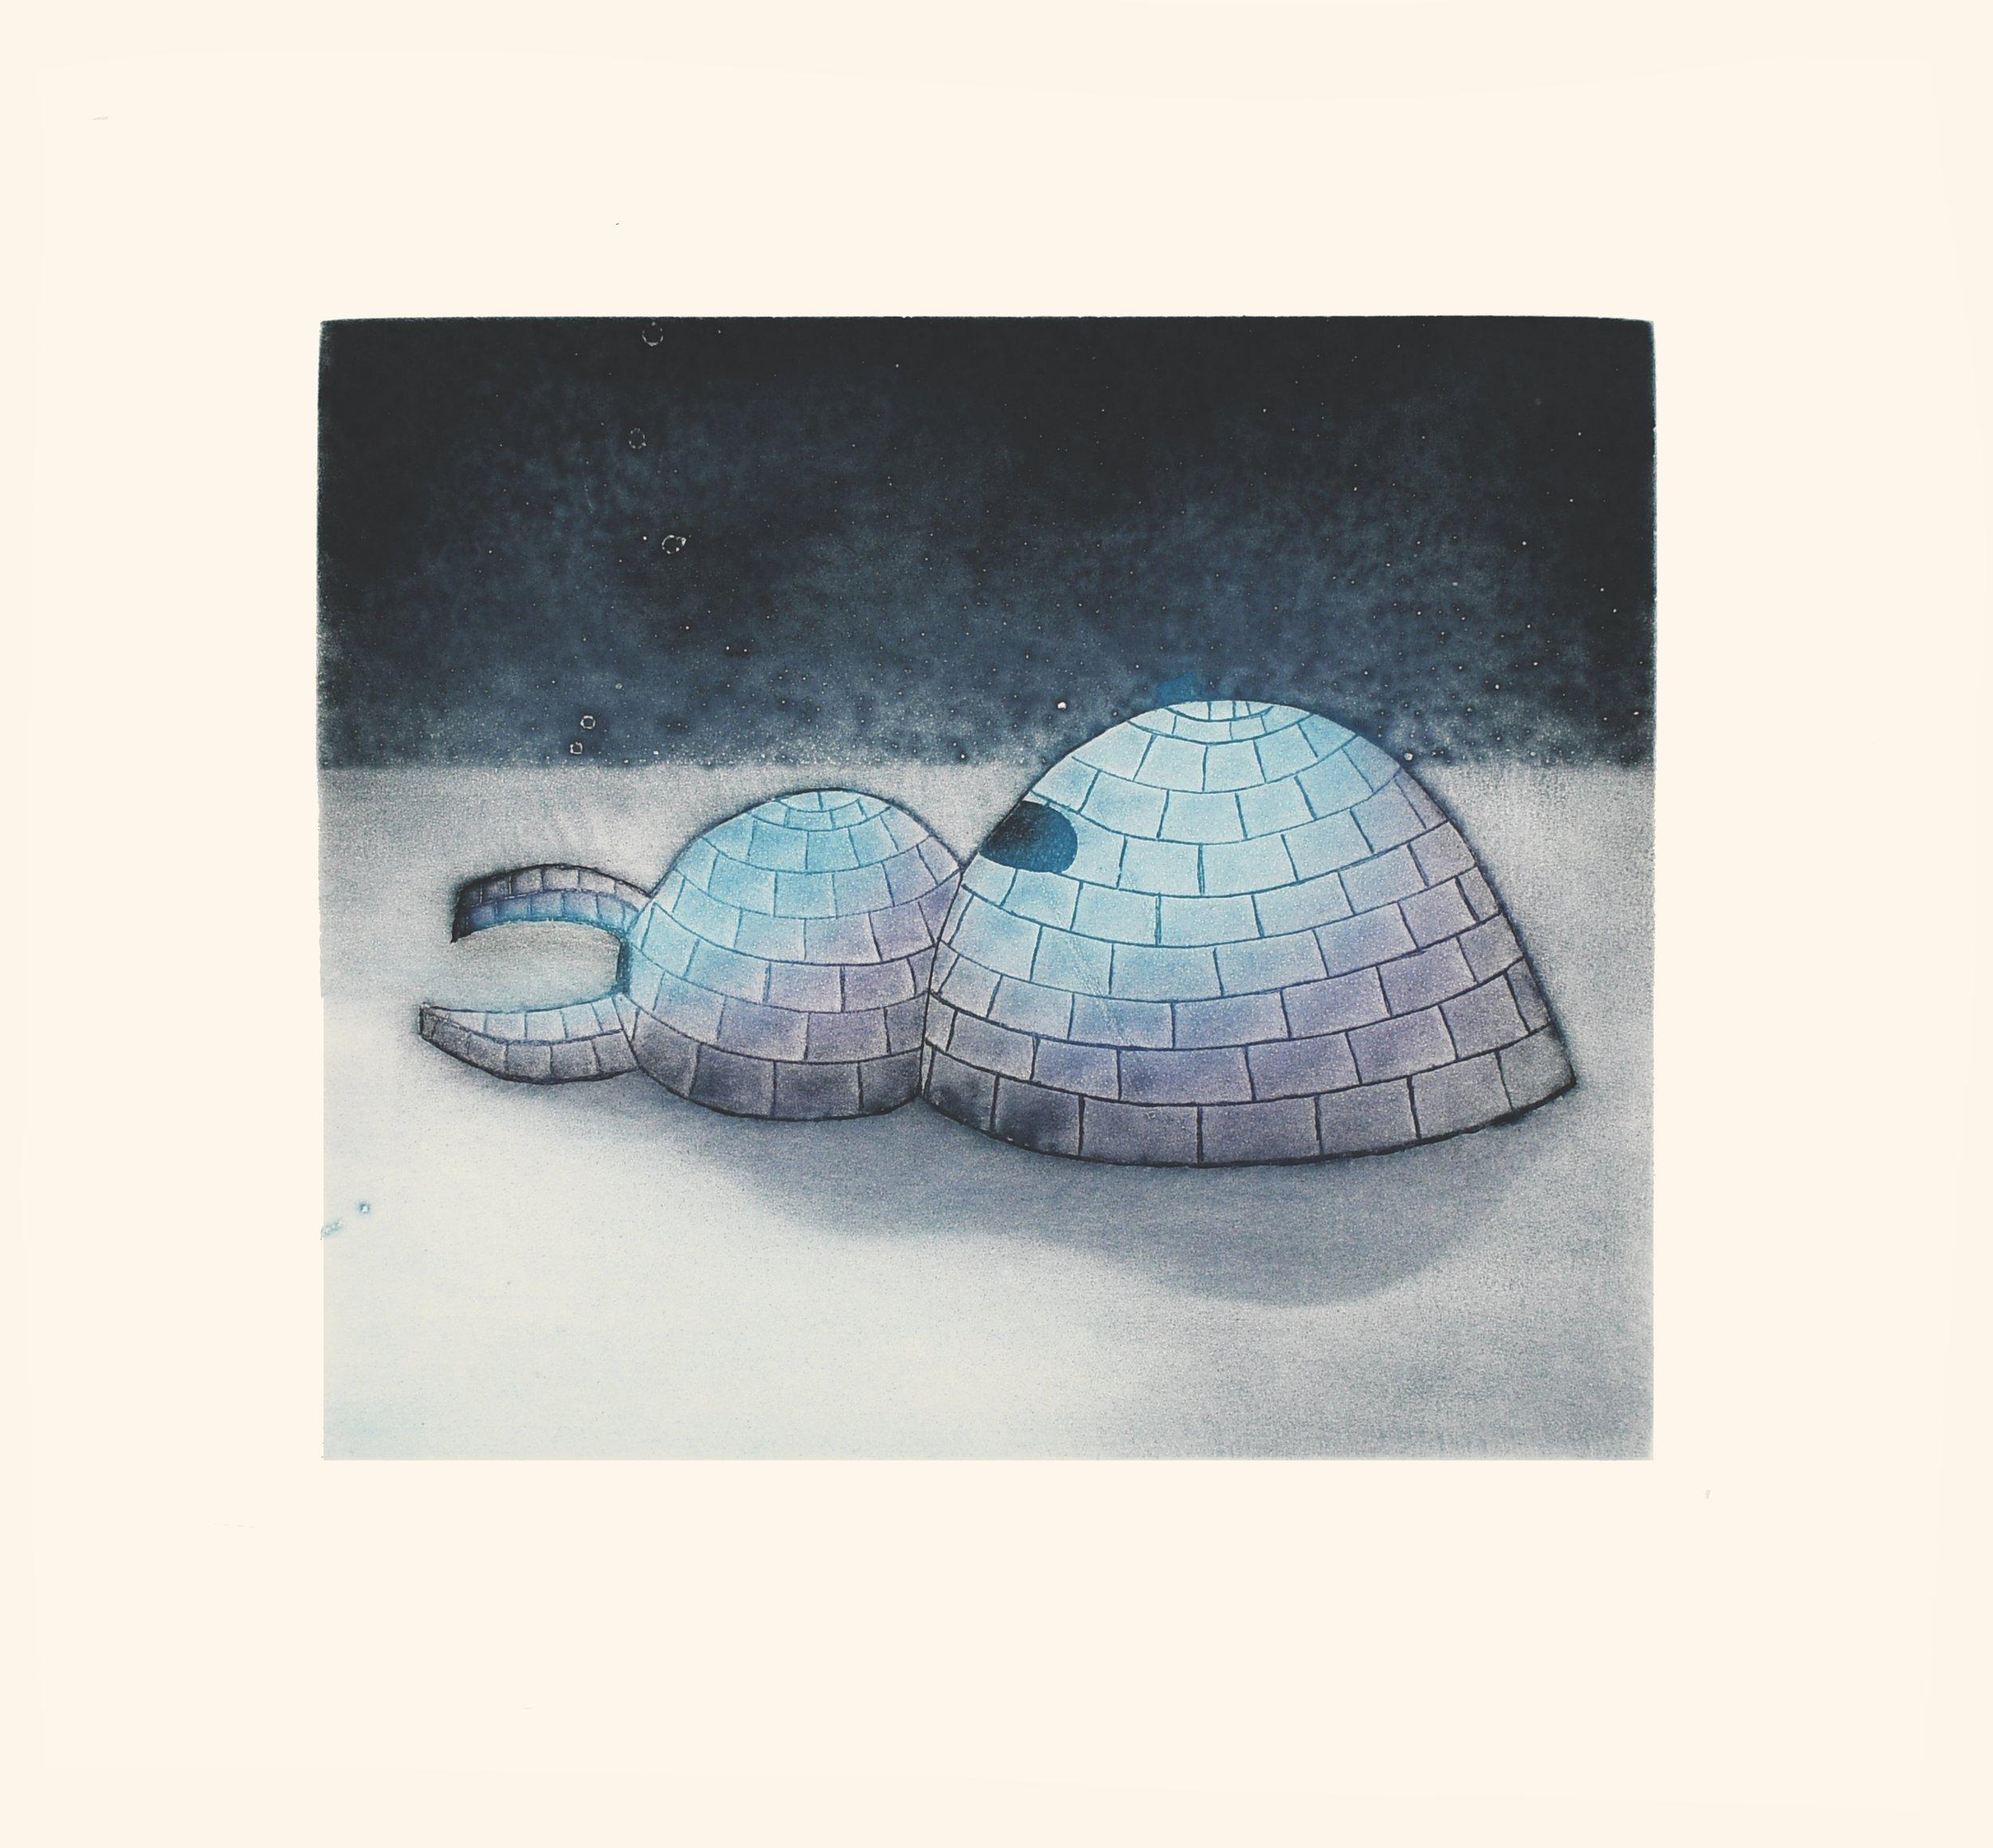 "SITA SAILA 25. Igluvigaq (A Place You Live) Etching & Aquatint Paper: Arches White Printer: Studio PM 44.7 x 48 cm 17 ½"" x 19"" $ 600 $480 450"